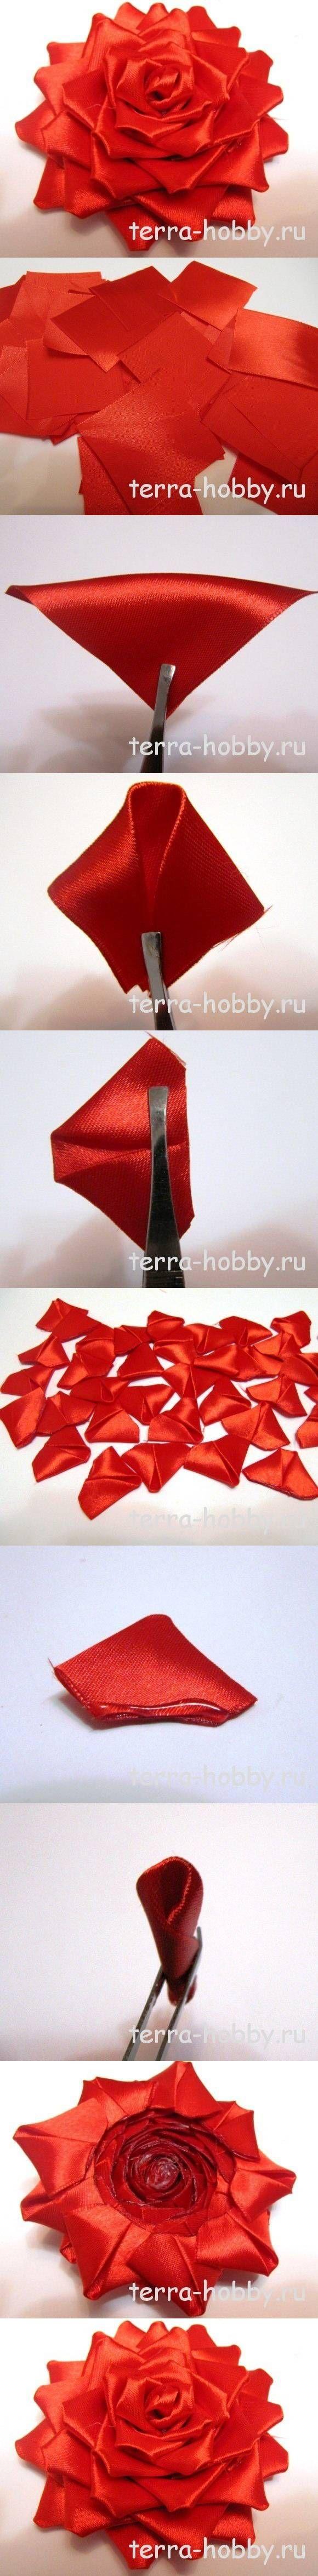 Diy Elegant Ribbon Red Rose For Wedding Manualidad Linda Bella Flor De Tela  Cinta Roja En